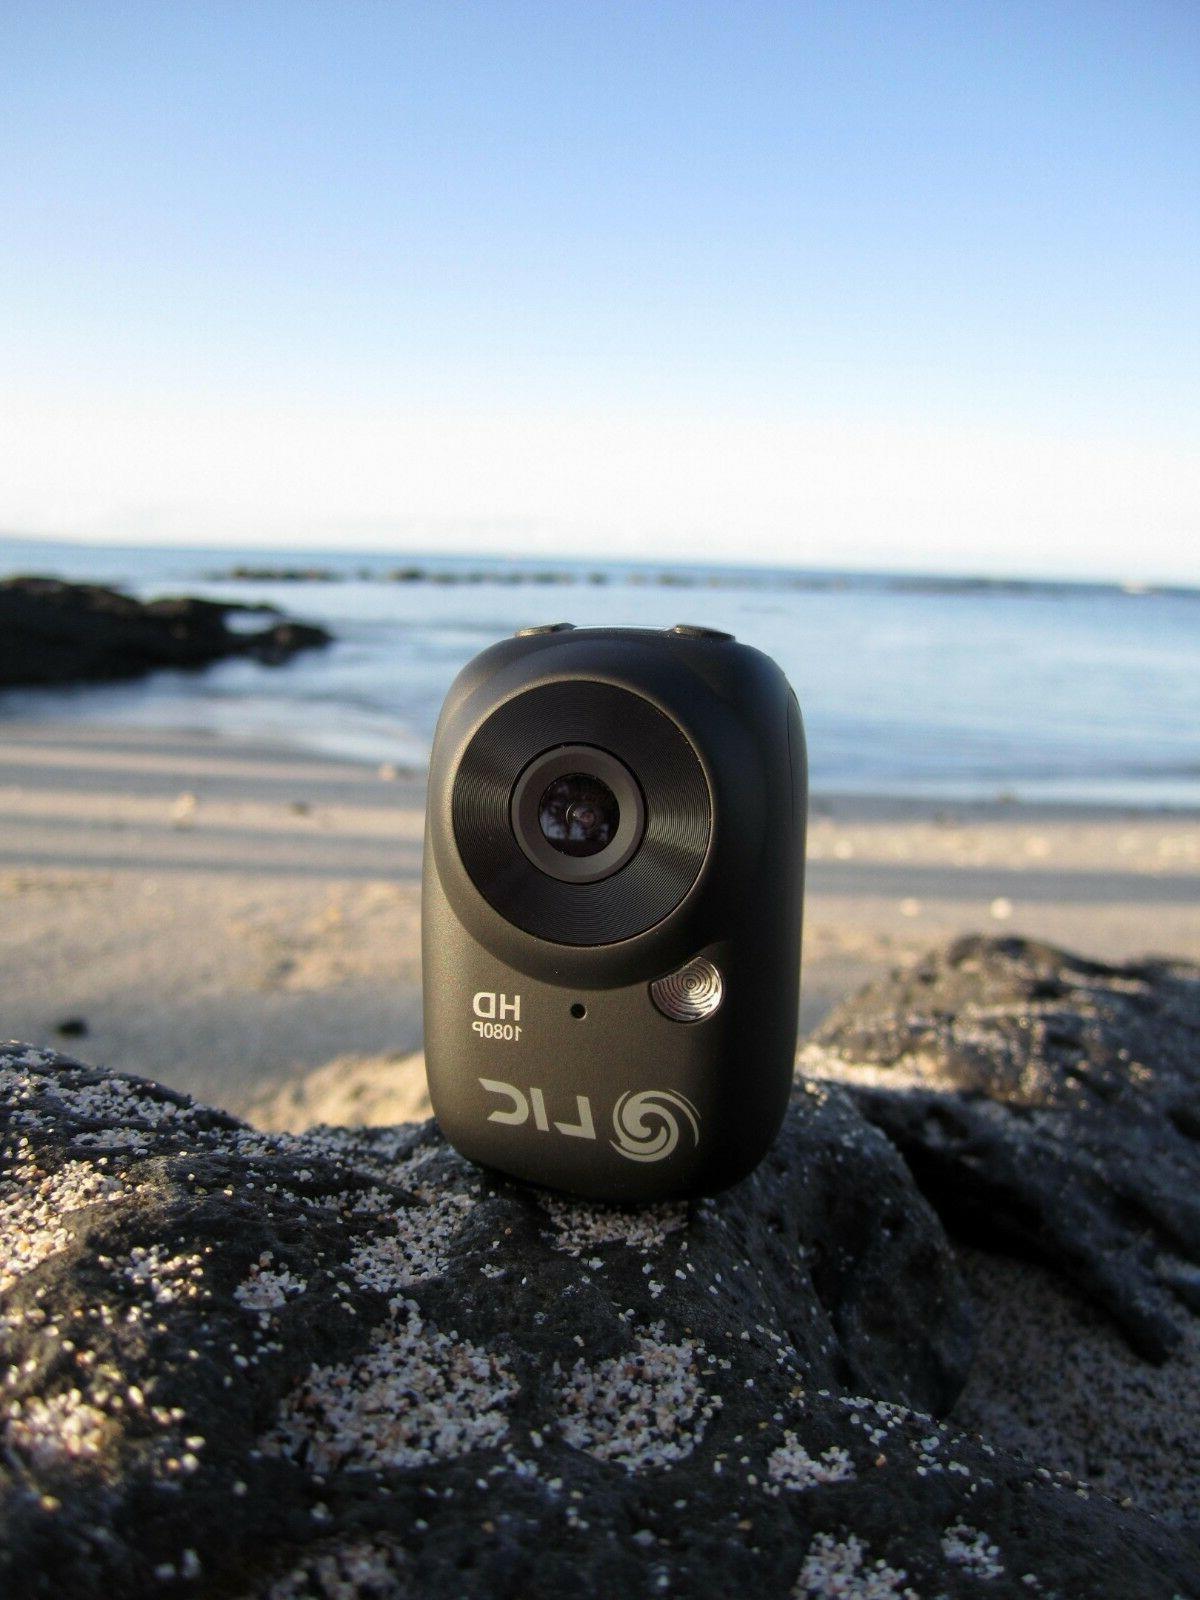 ego series 727blk mountable sport video camera